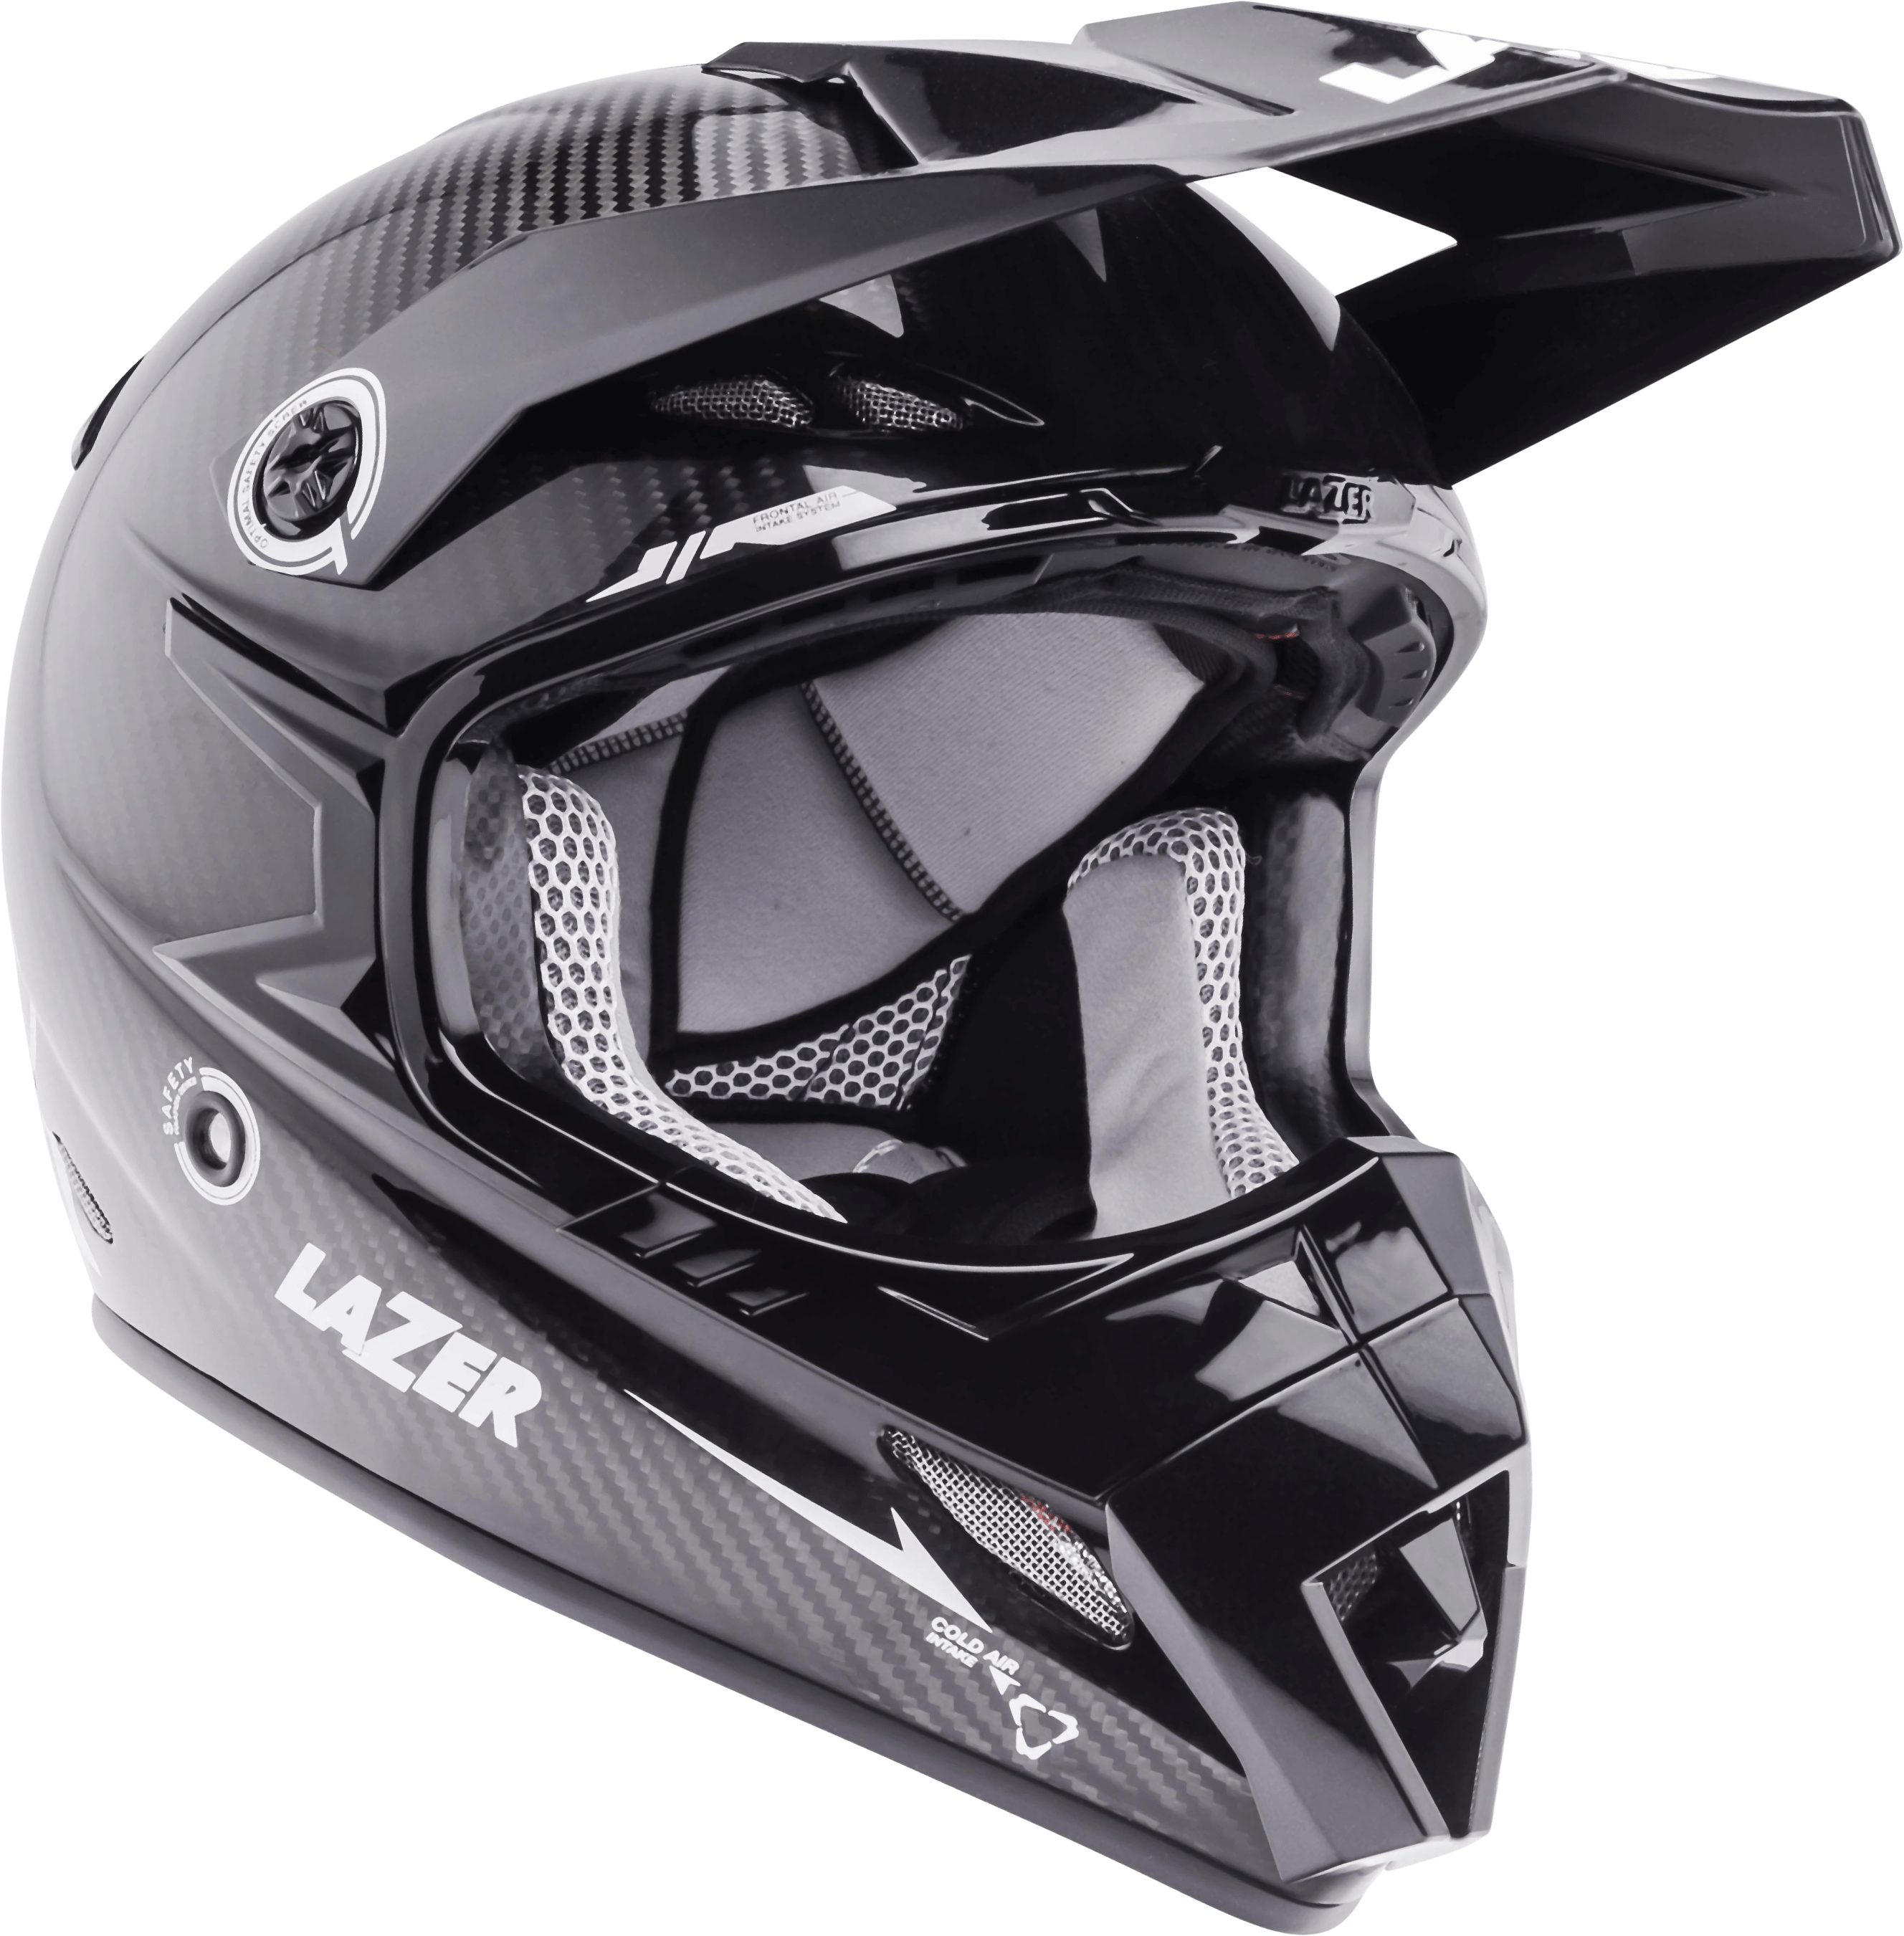 Helmet png. Motorcycle lazer mx pure